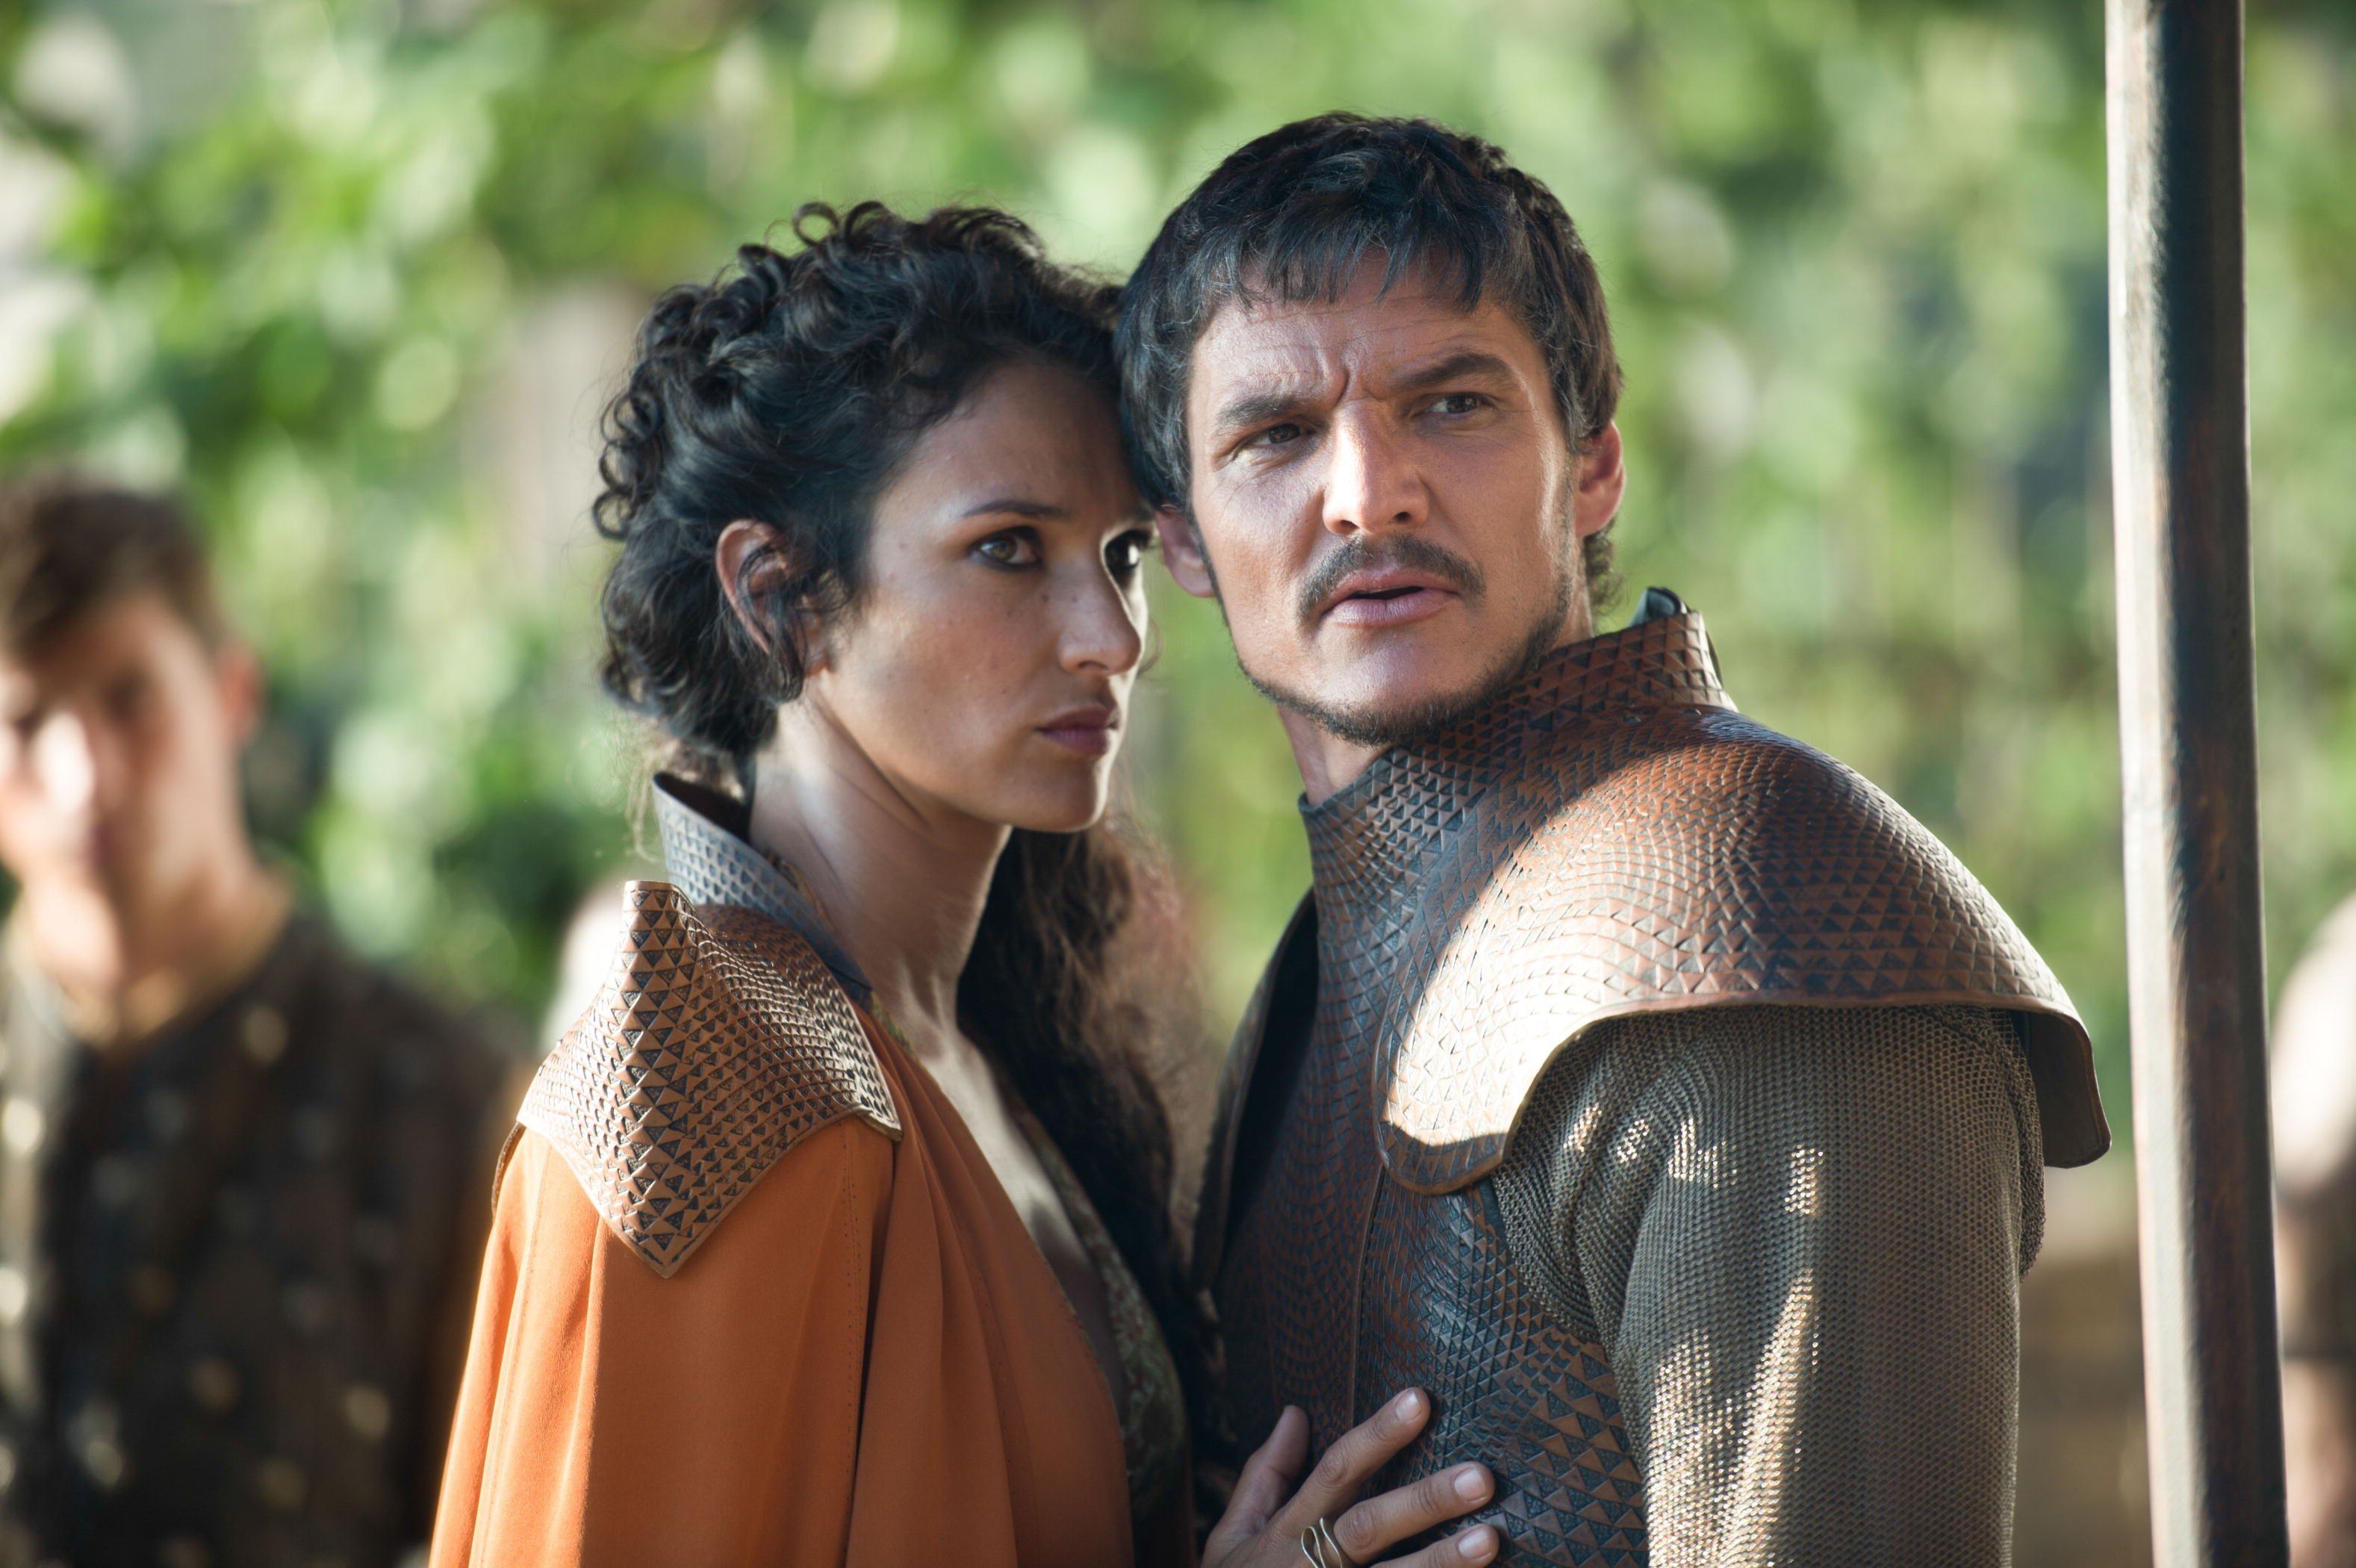 Season 4, Episode 8 – The Mountain and the fira, viper